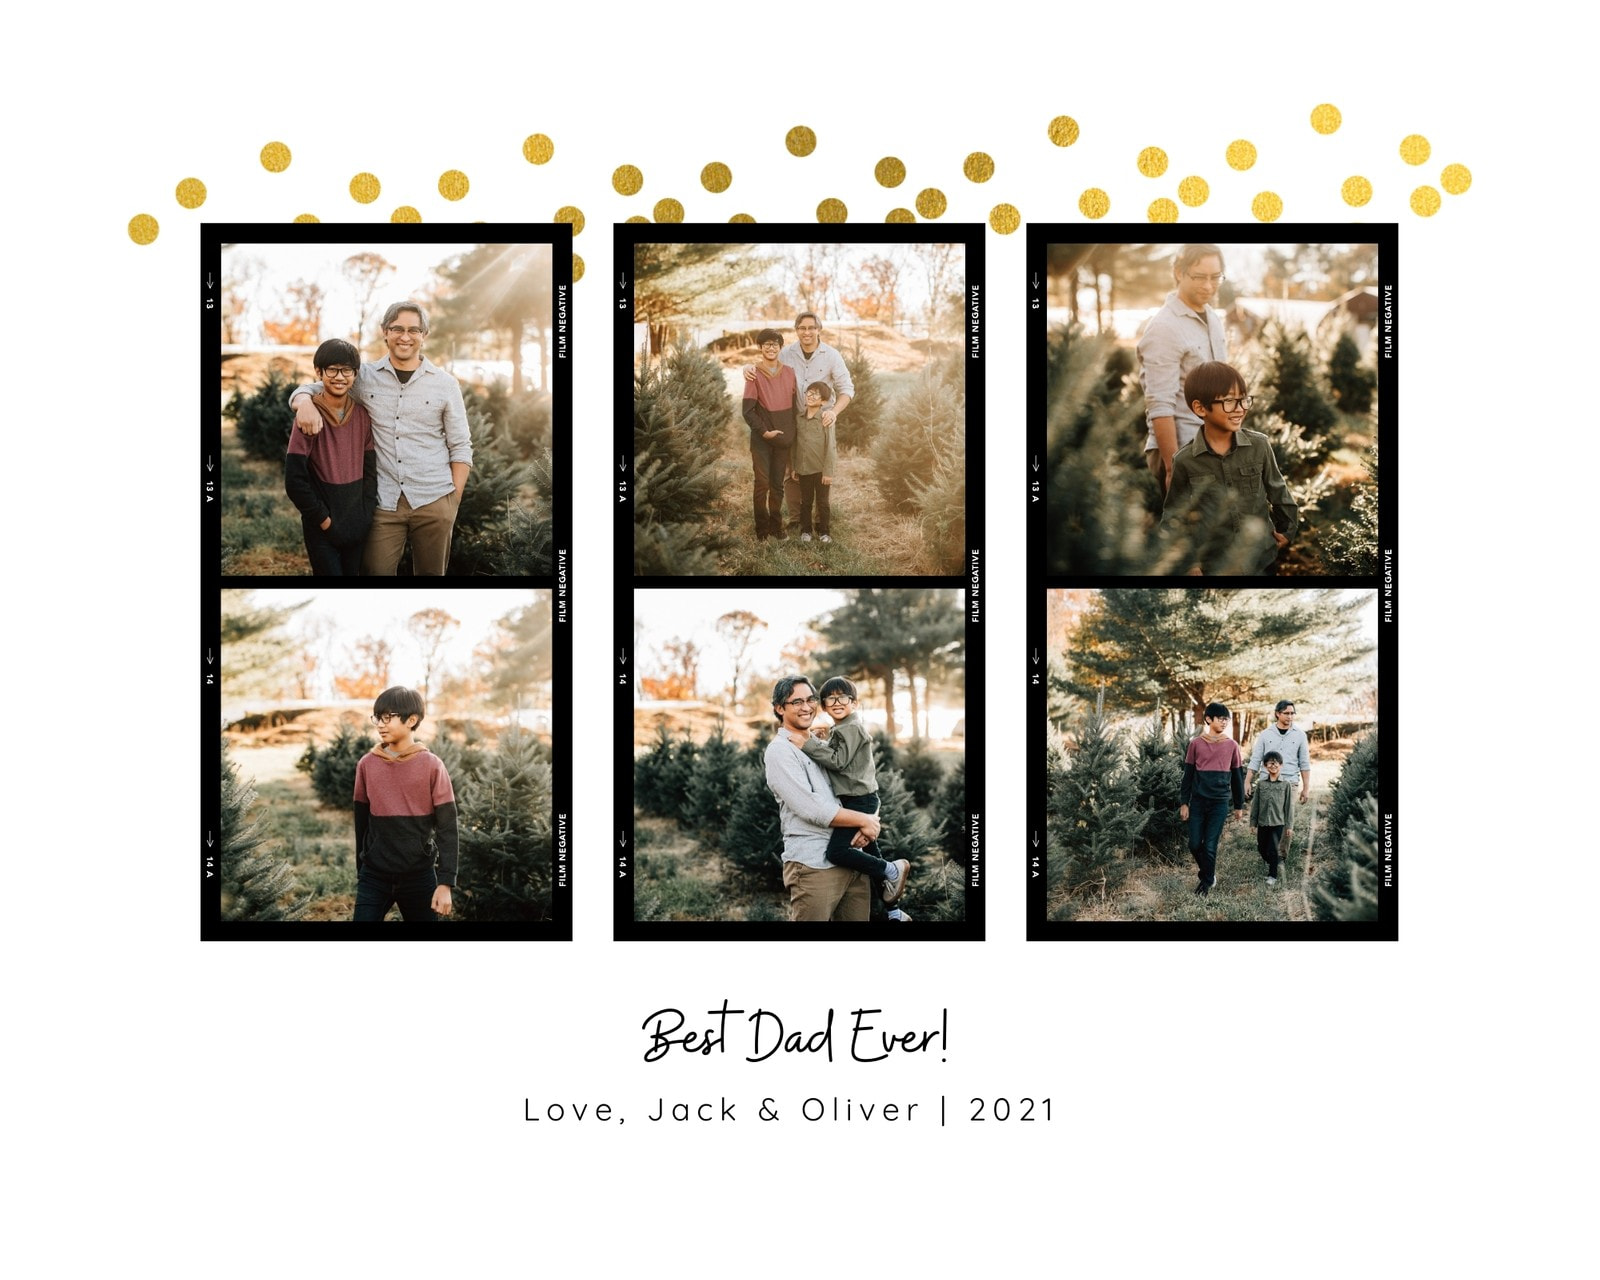 Gold & Black Best Dad Ever Photo Collage